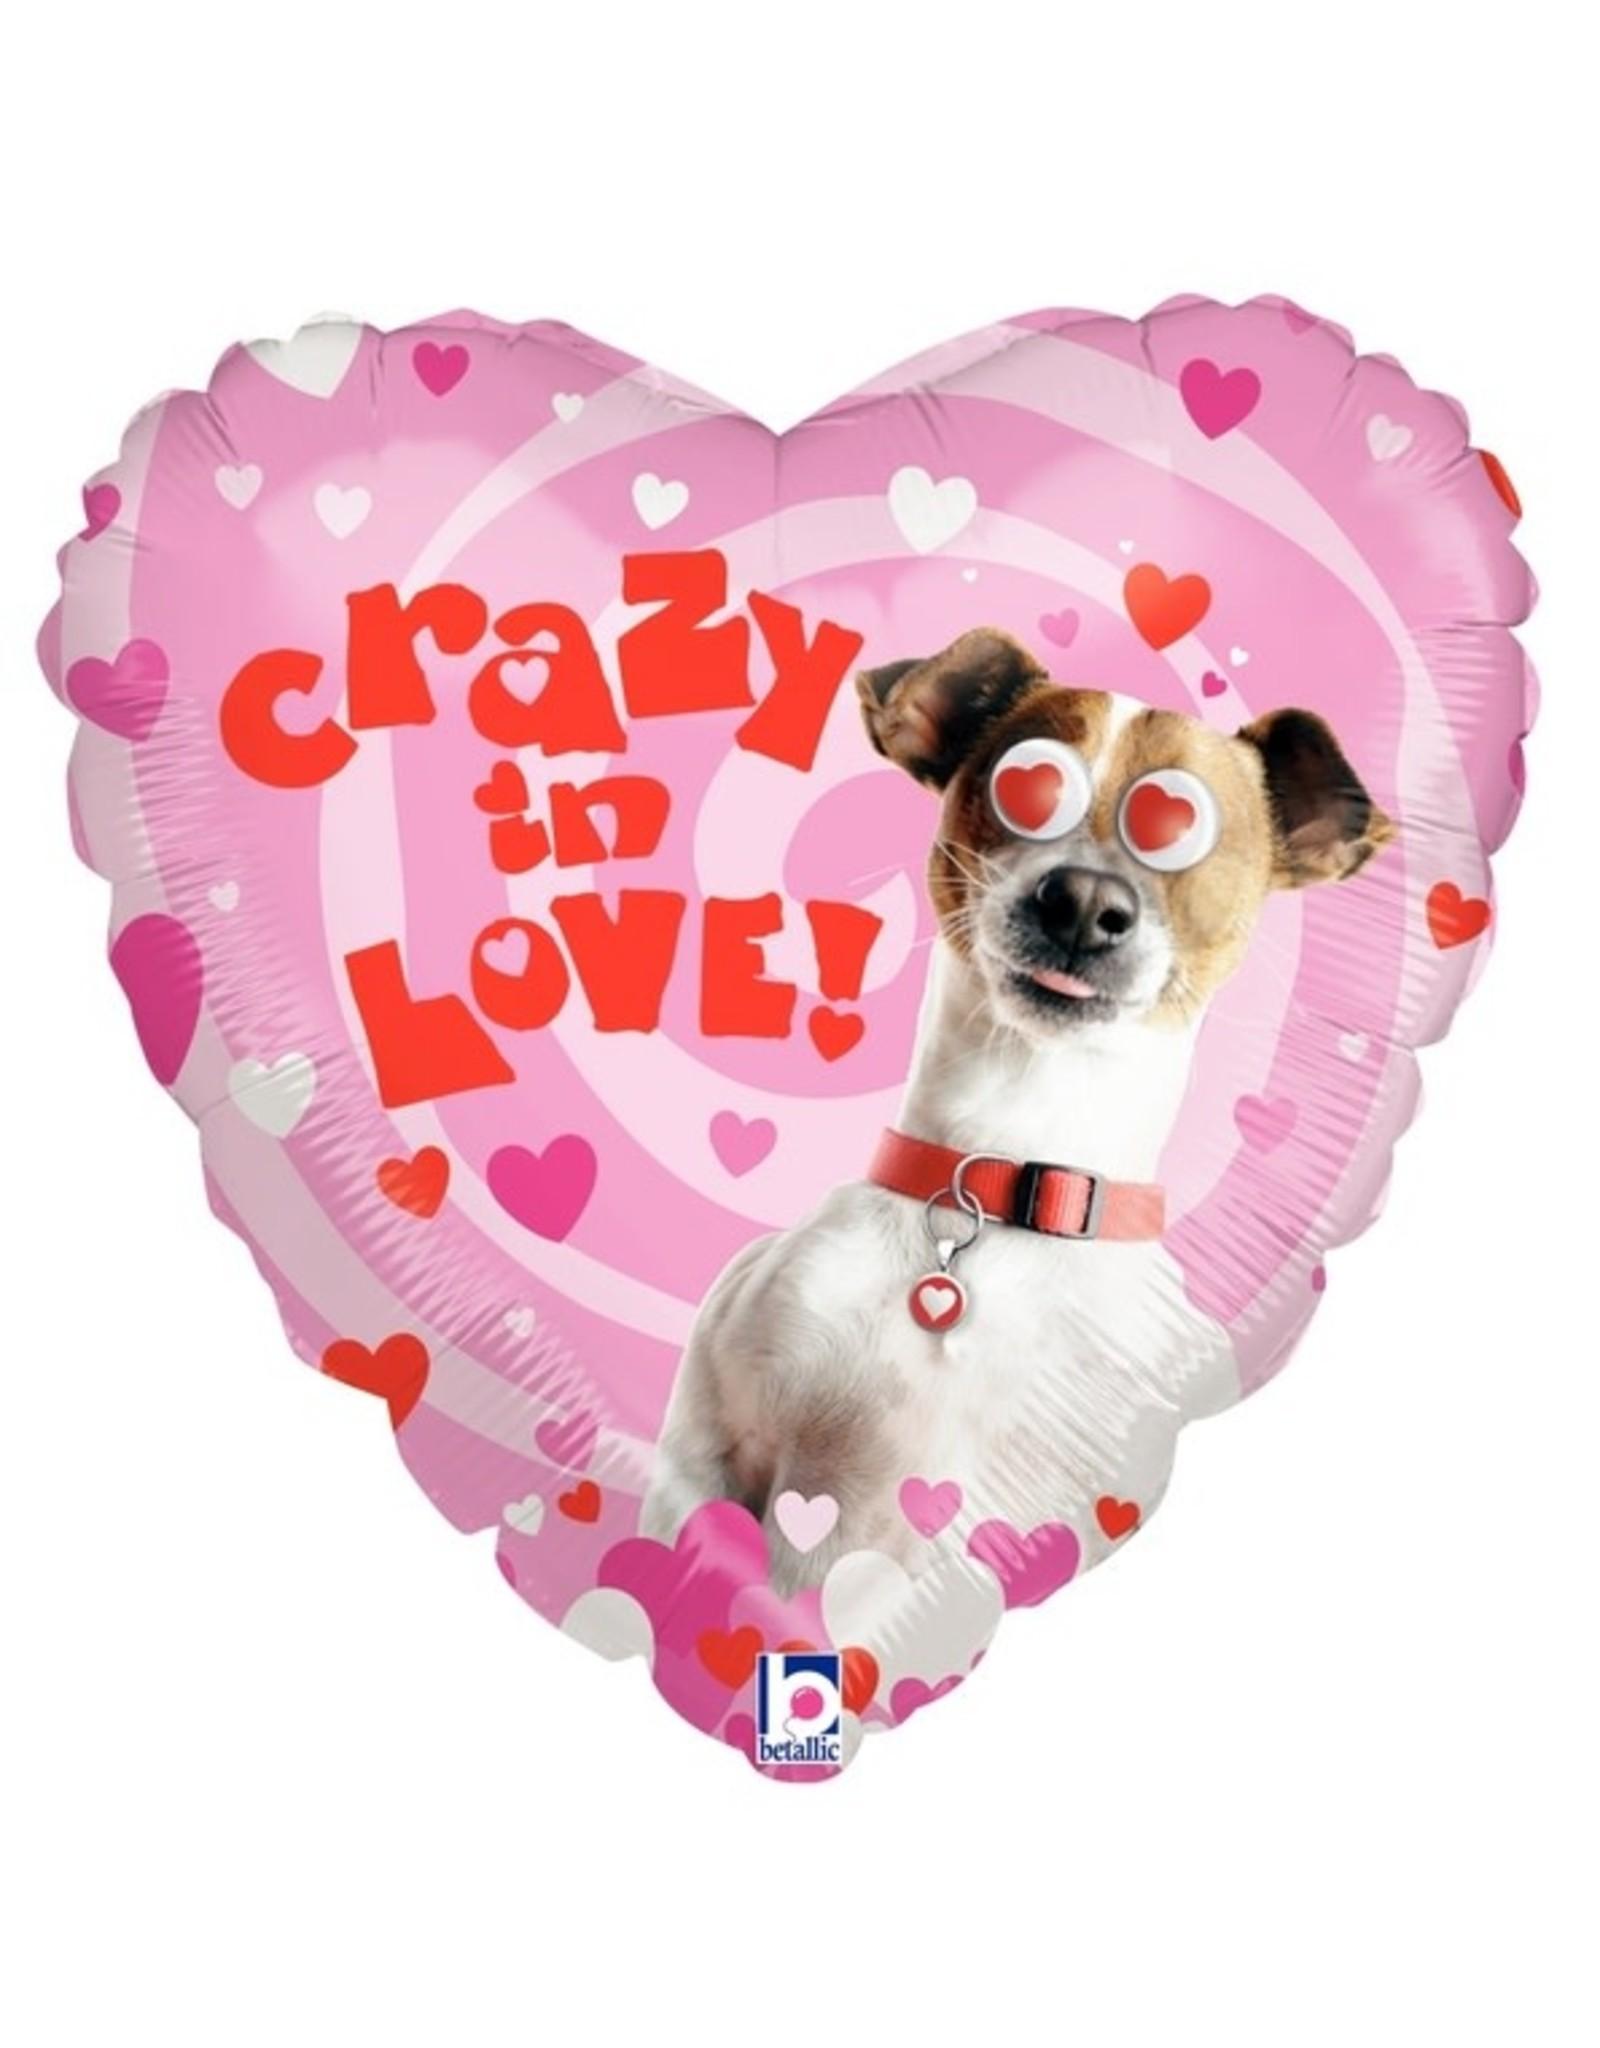 """Crazy in Love"" Folie Ballon"